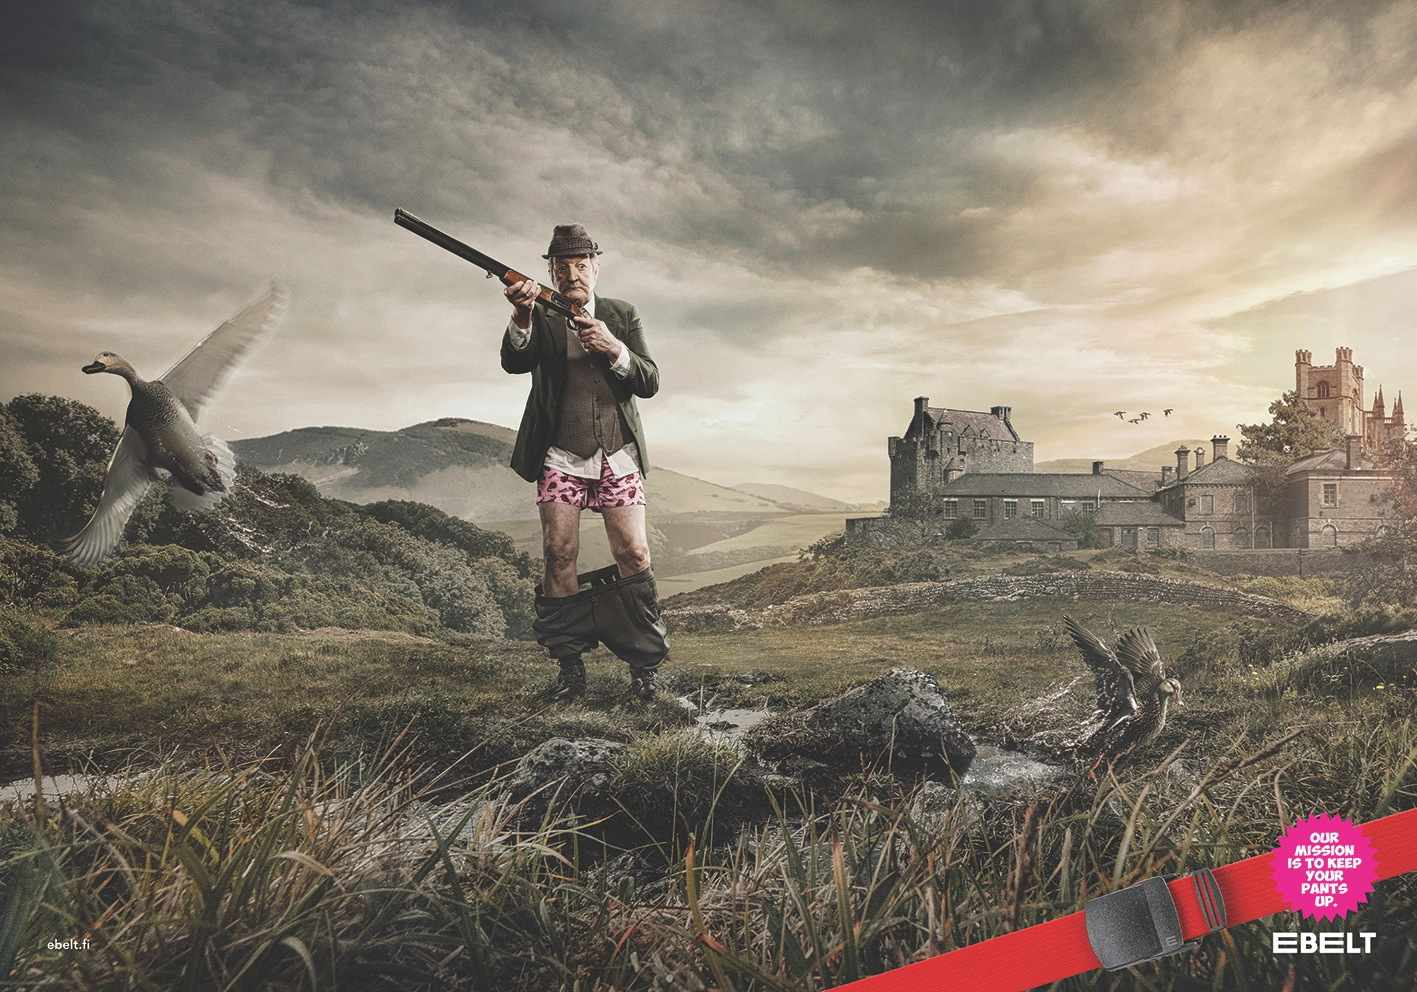 ebelt_poster_50x35cm_hunting_72dpi_aotw